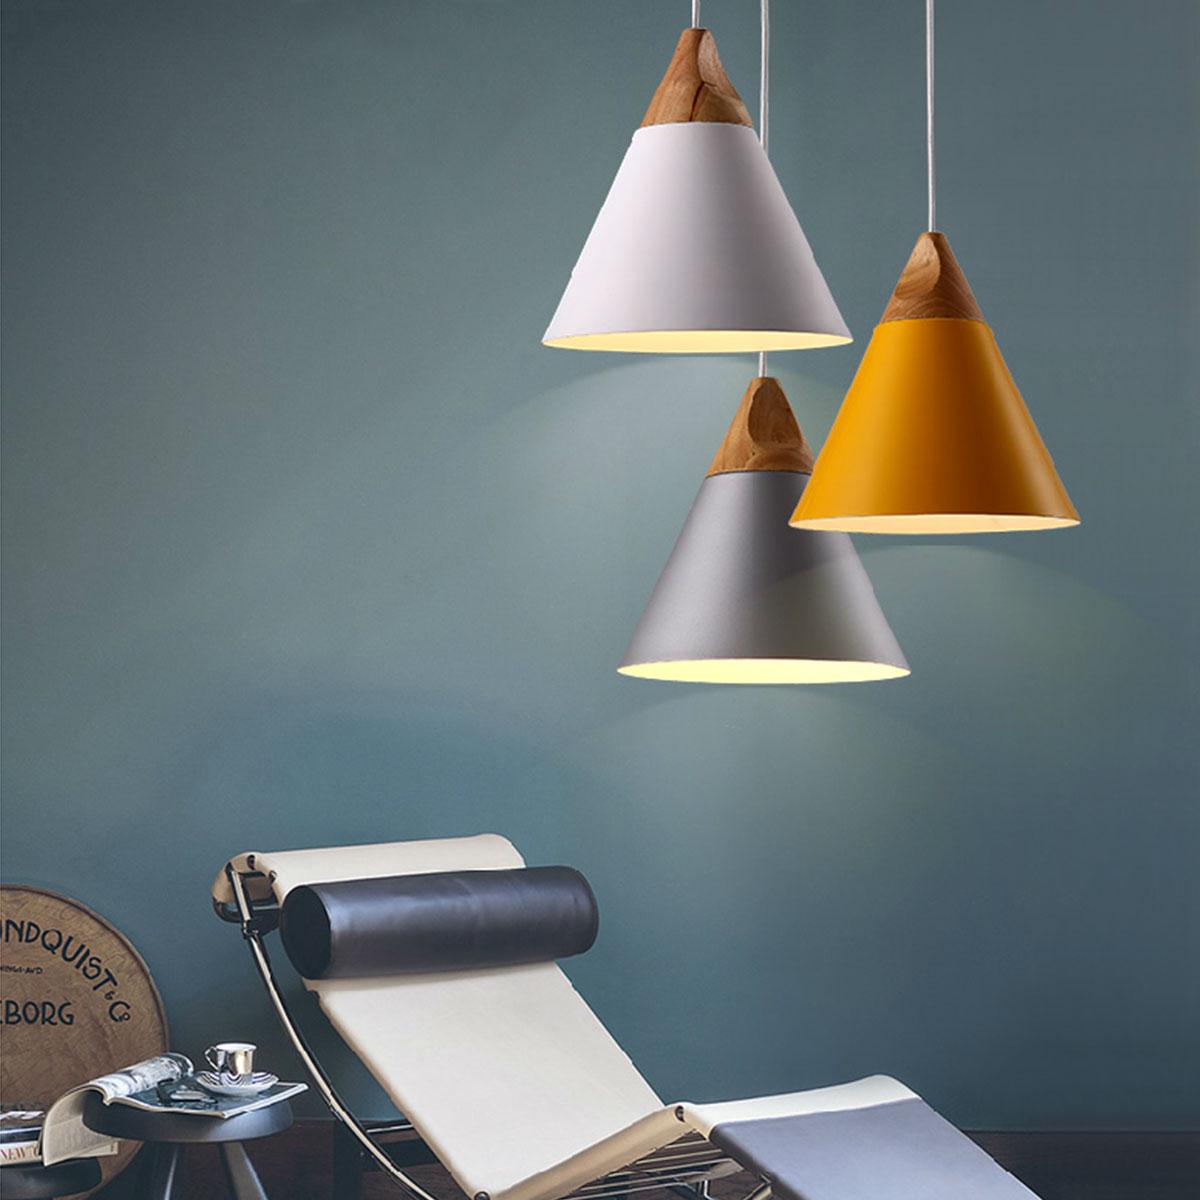 Gentil 1pc European White/Yellow/Grey E27 Pendant Light Modern Simple Wood Pendant  Lamp Bar Counter Lights Cafe Dining Room Decor In Pendant Lights From Lights  ...